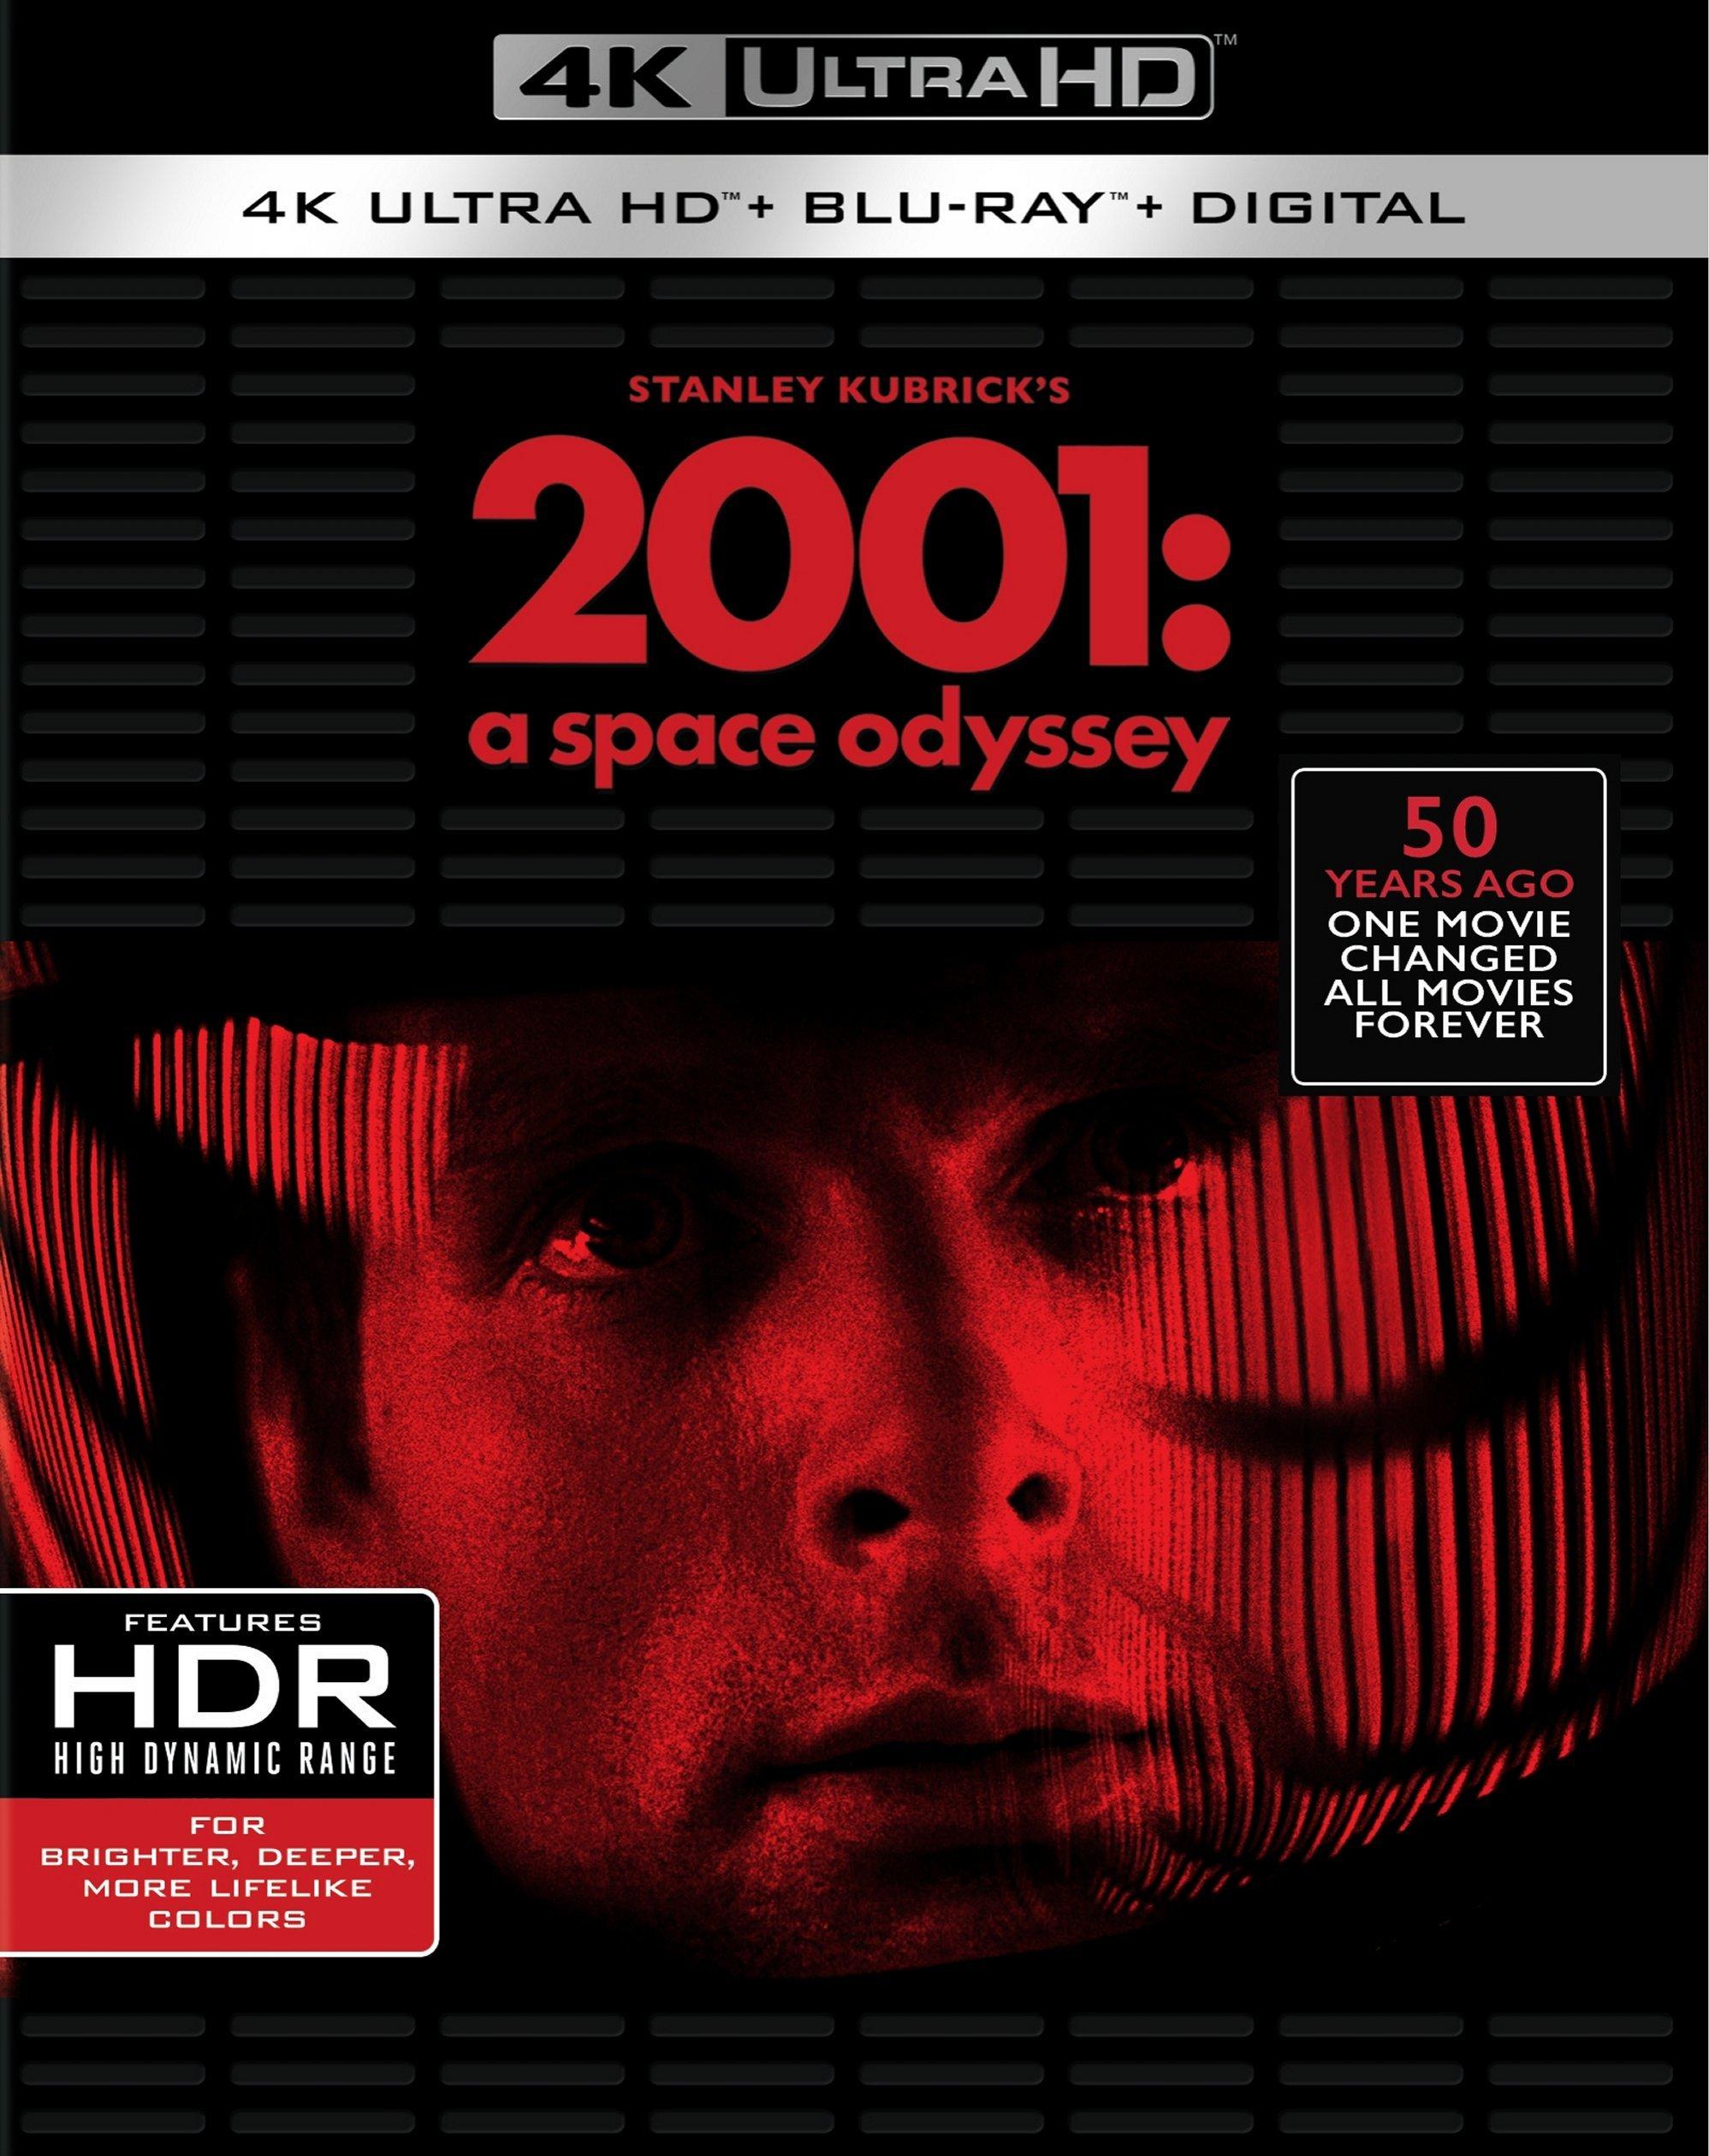 2001: A Space Odyssey 4K (1968) Ultra HD Blu-ray